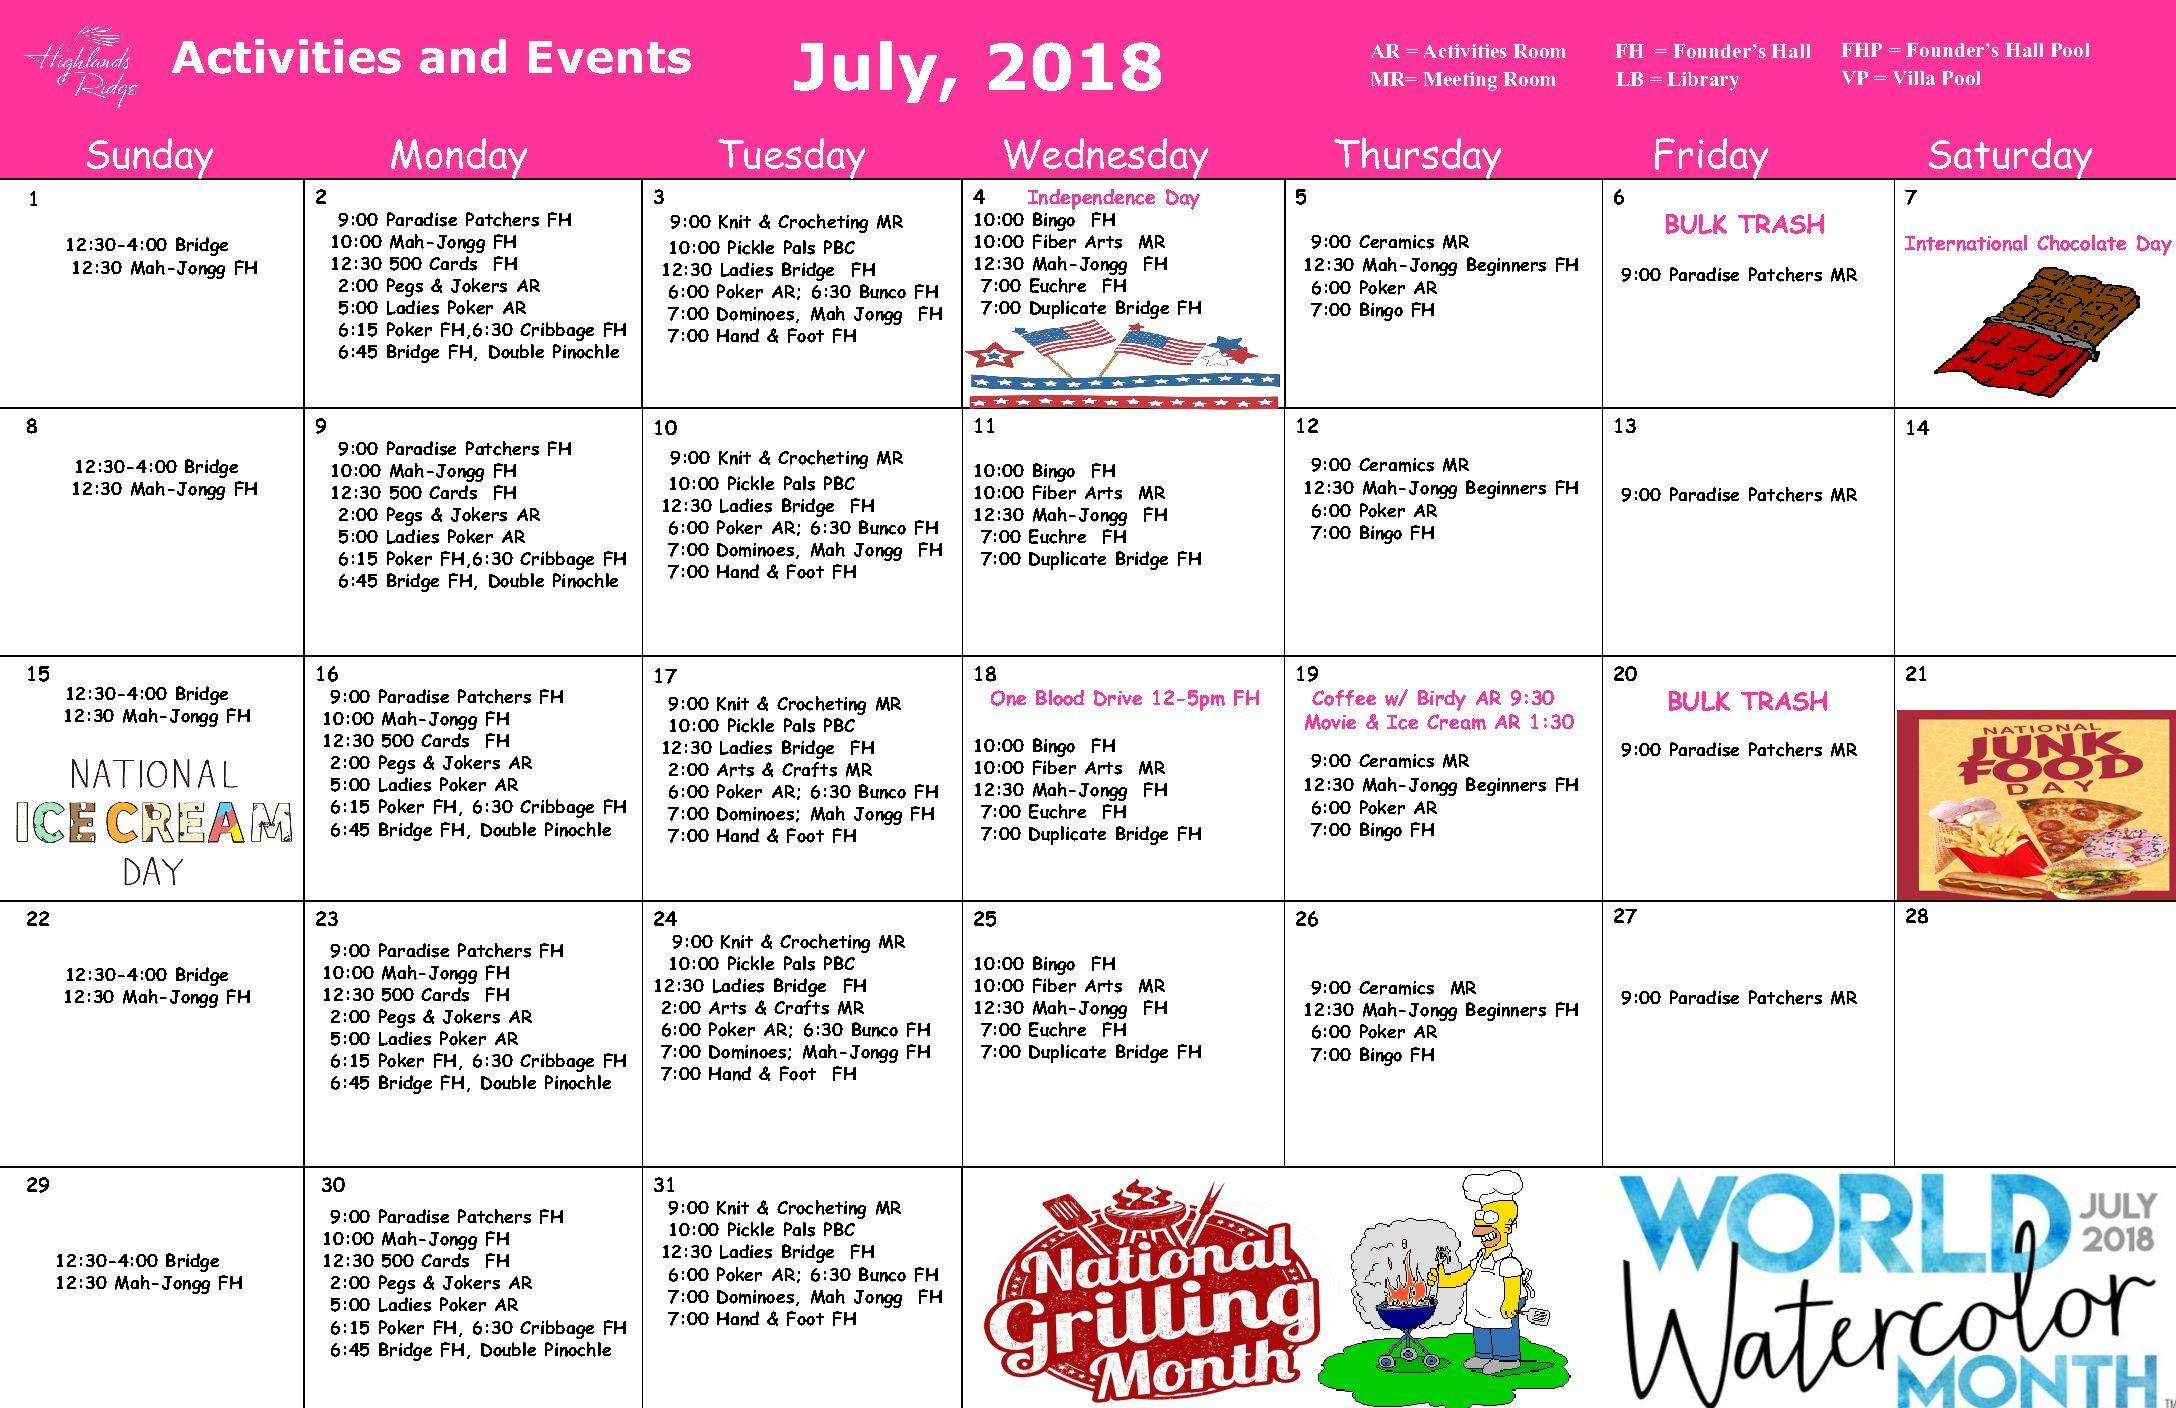 July 2018 Activities Calendar